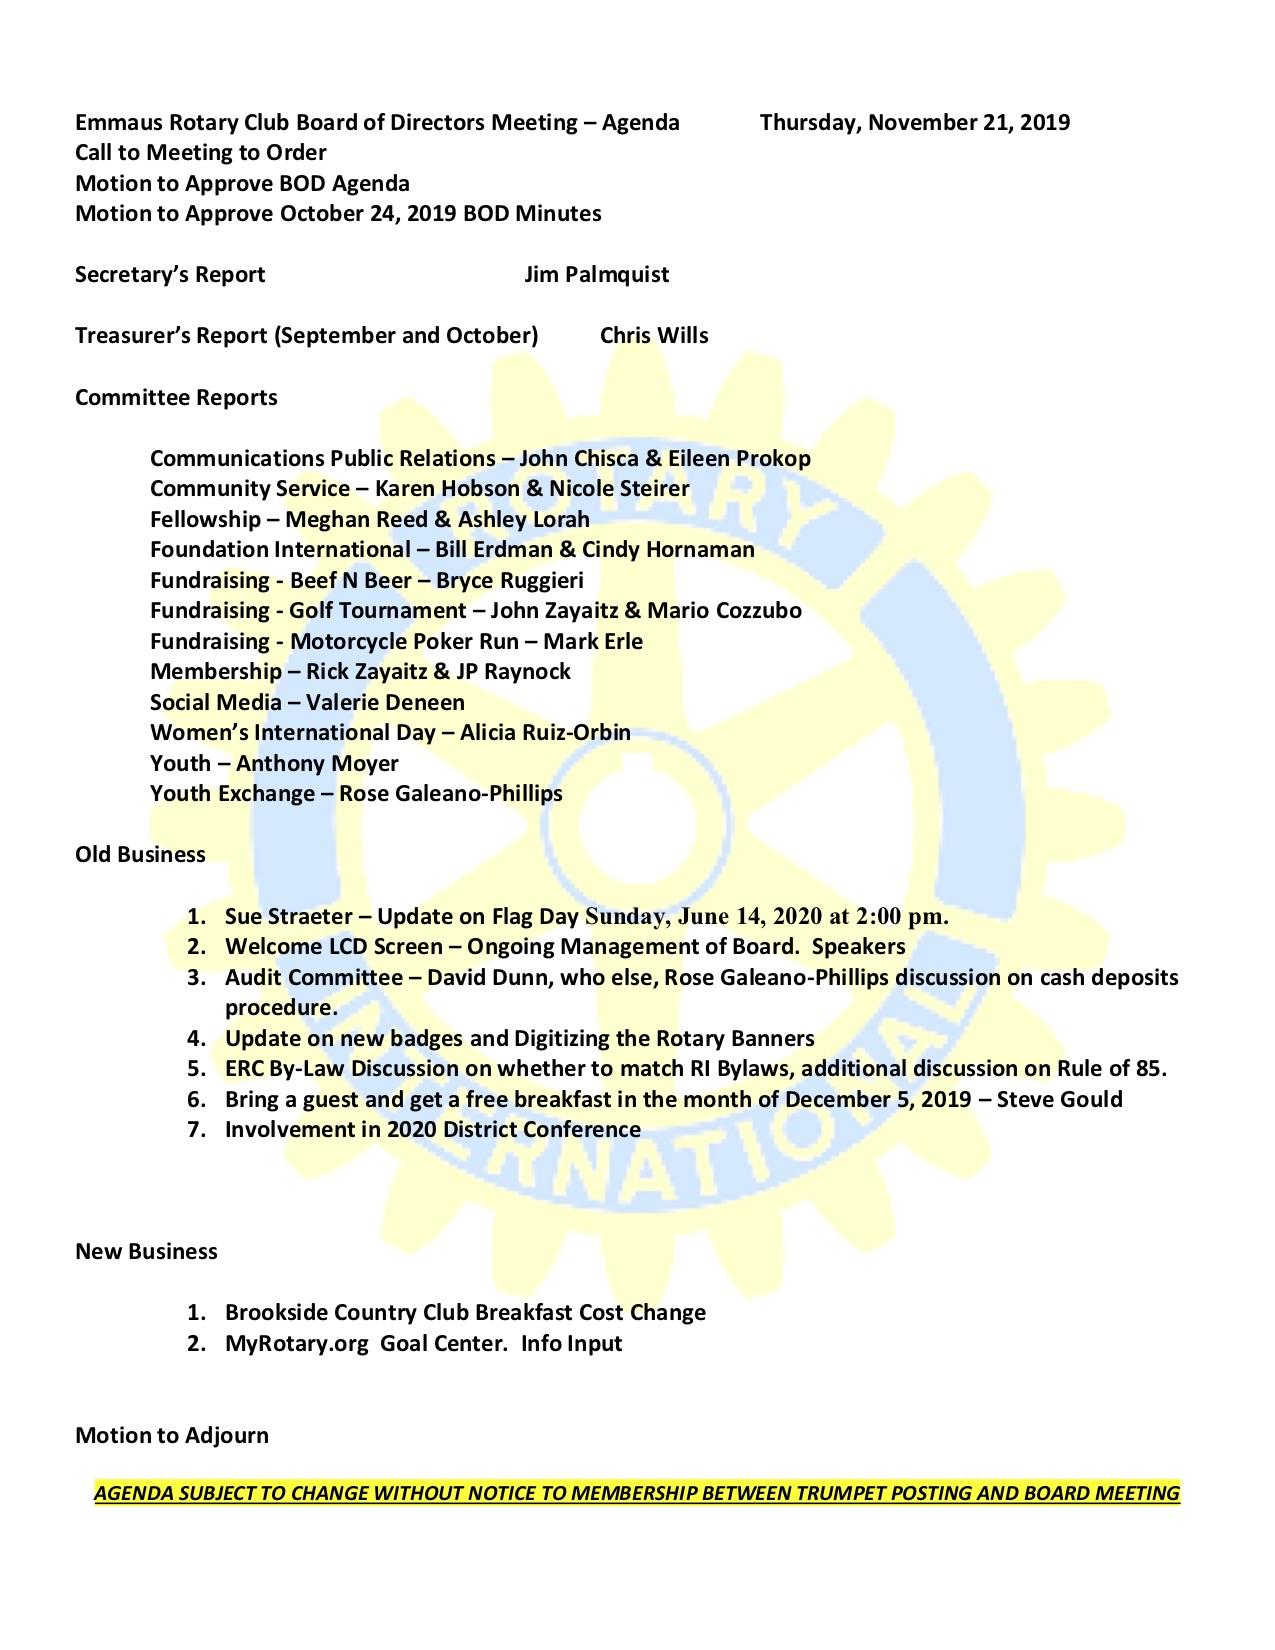 Stories Rotary Club Of Emmaus